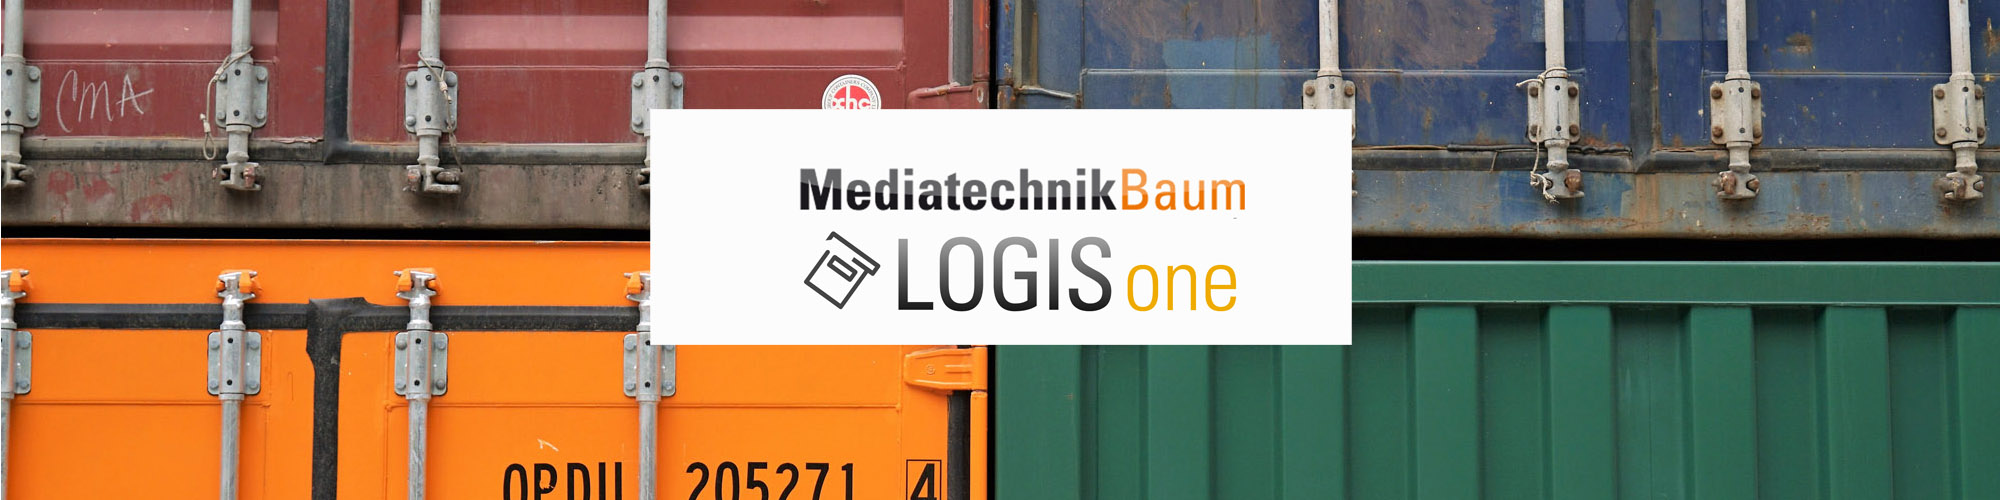 branchenlösung, branchenlösung logistik, branchenlösung distributionsunternehmen, erp lösung versand, erp lösung distributionsunternehmen, lager, logistik, sap business one